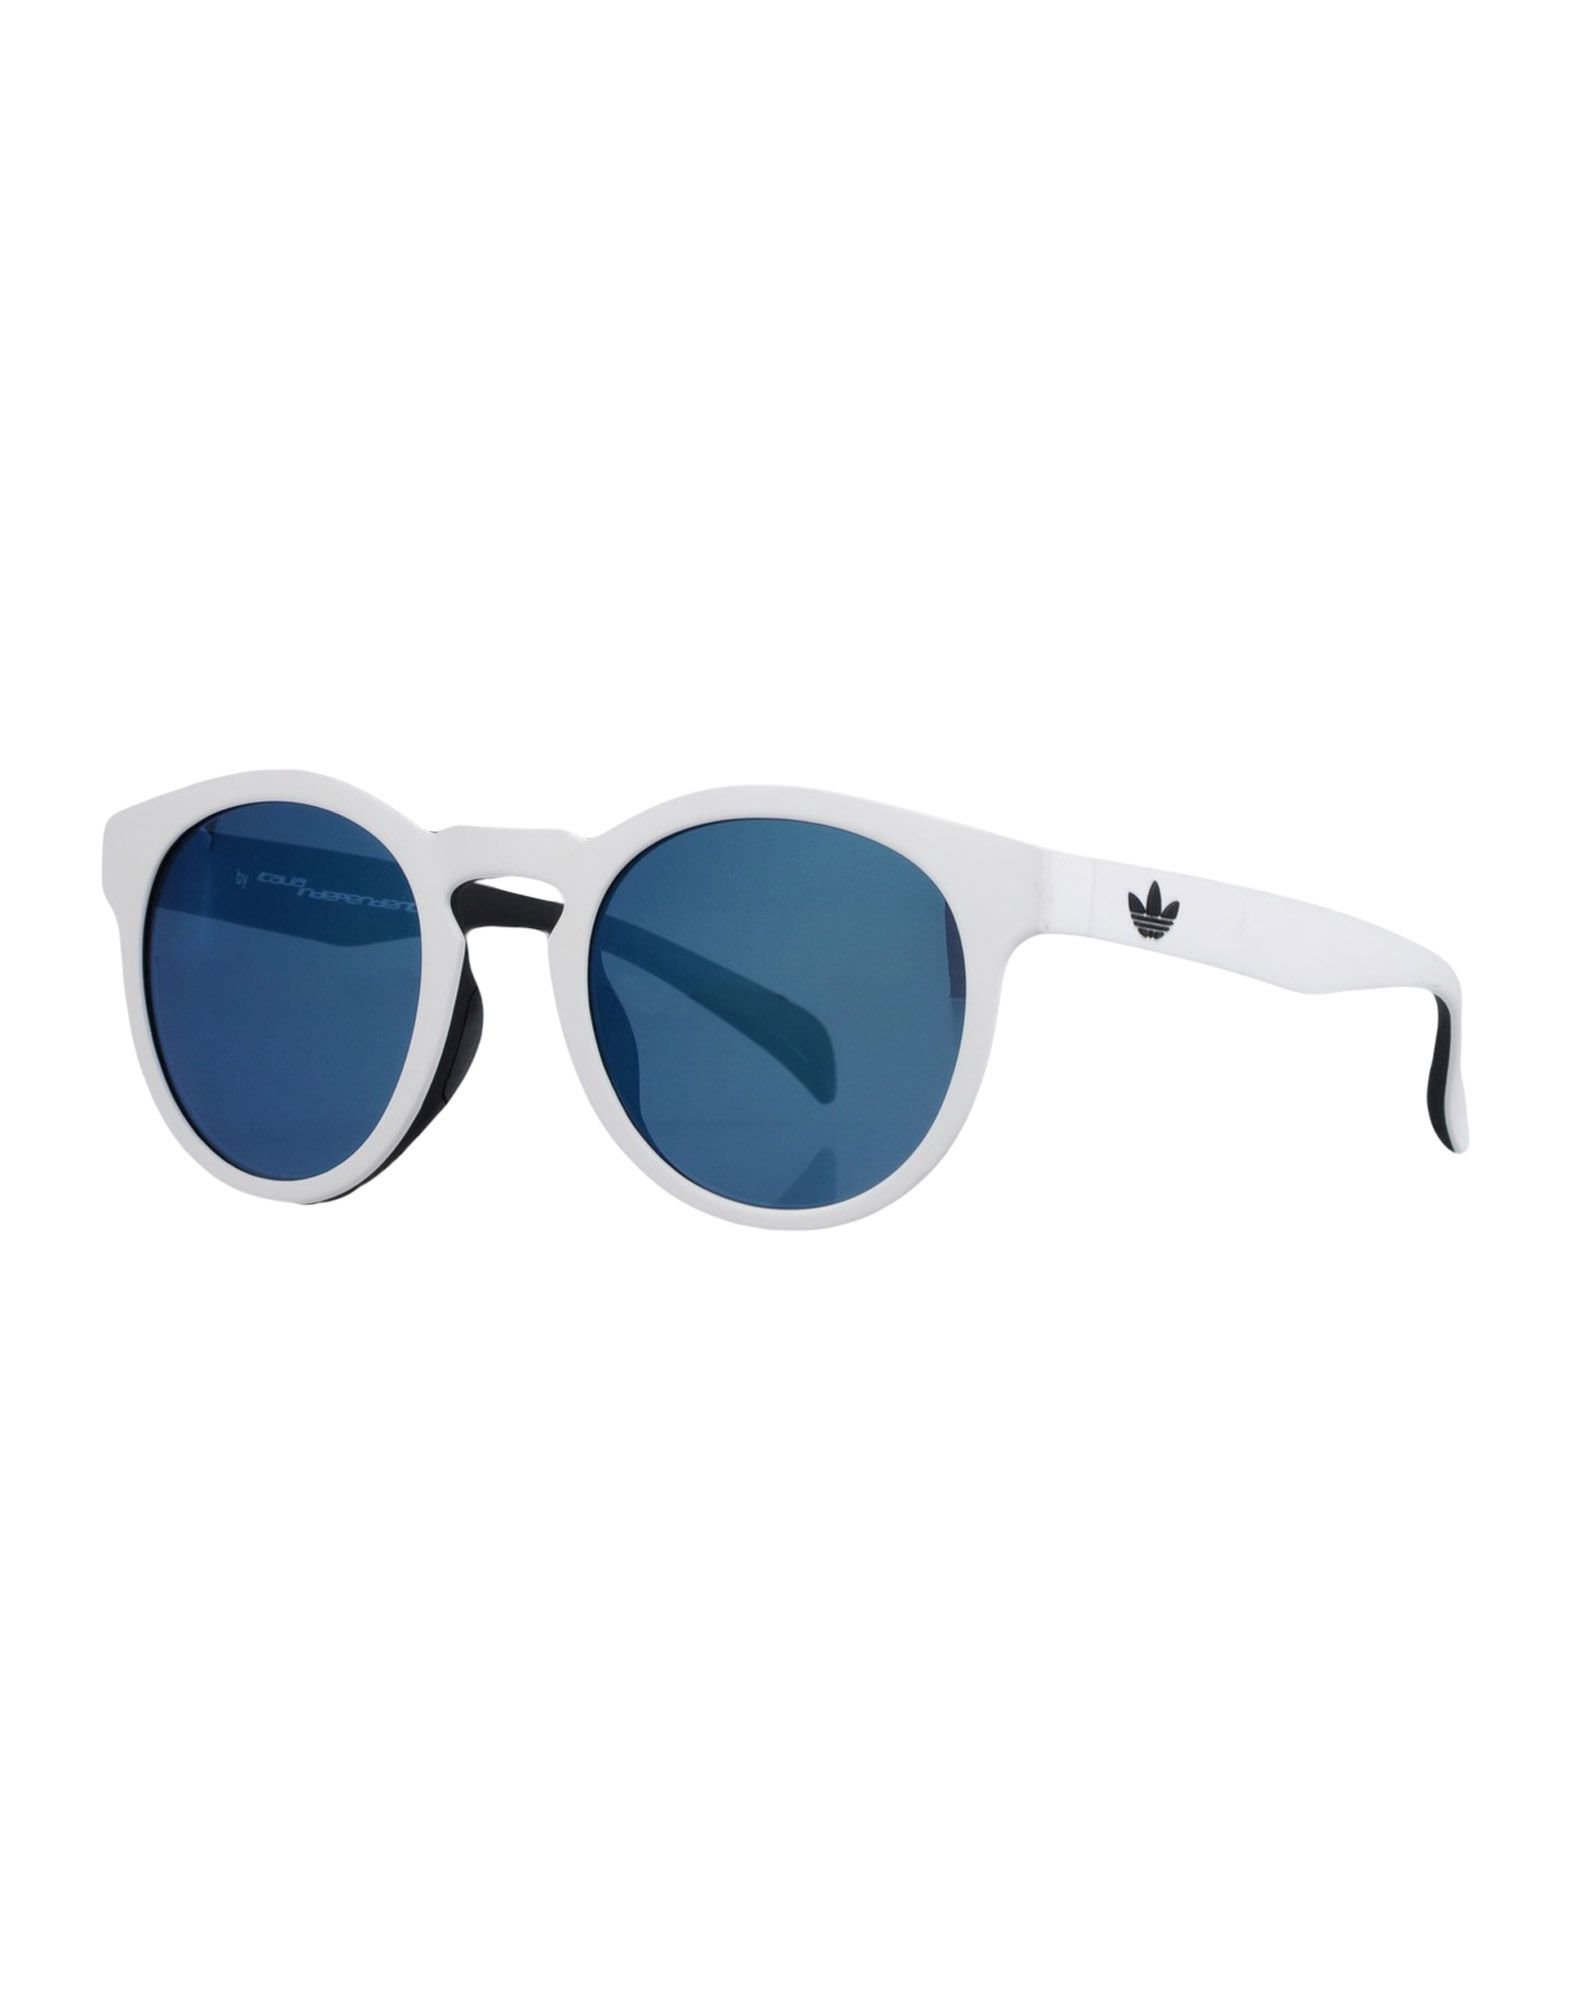 ADIDAS ORIGINALS by ITALIA INDEPENDENT Солнечные очки adidas originals by pharrell williams толстовка